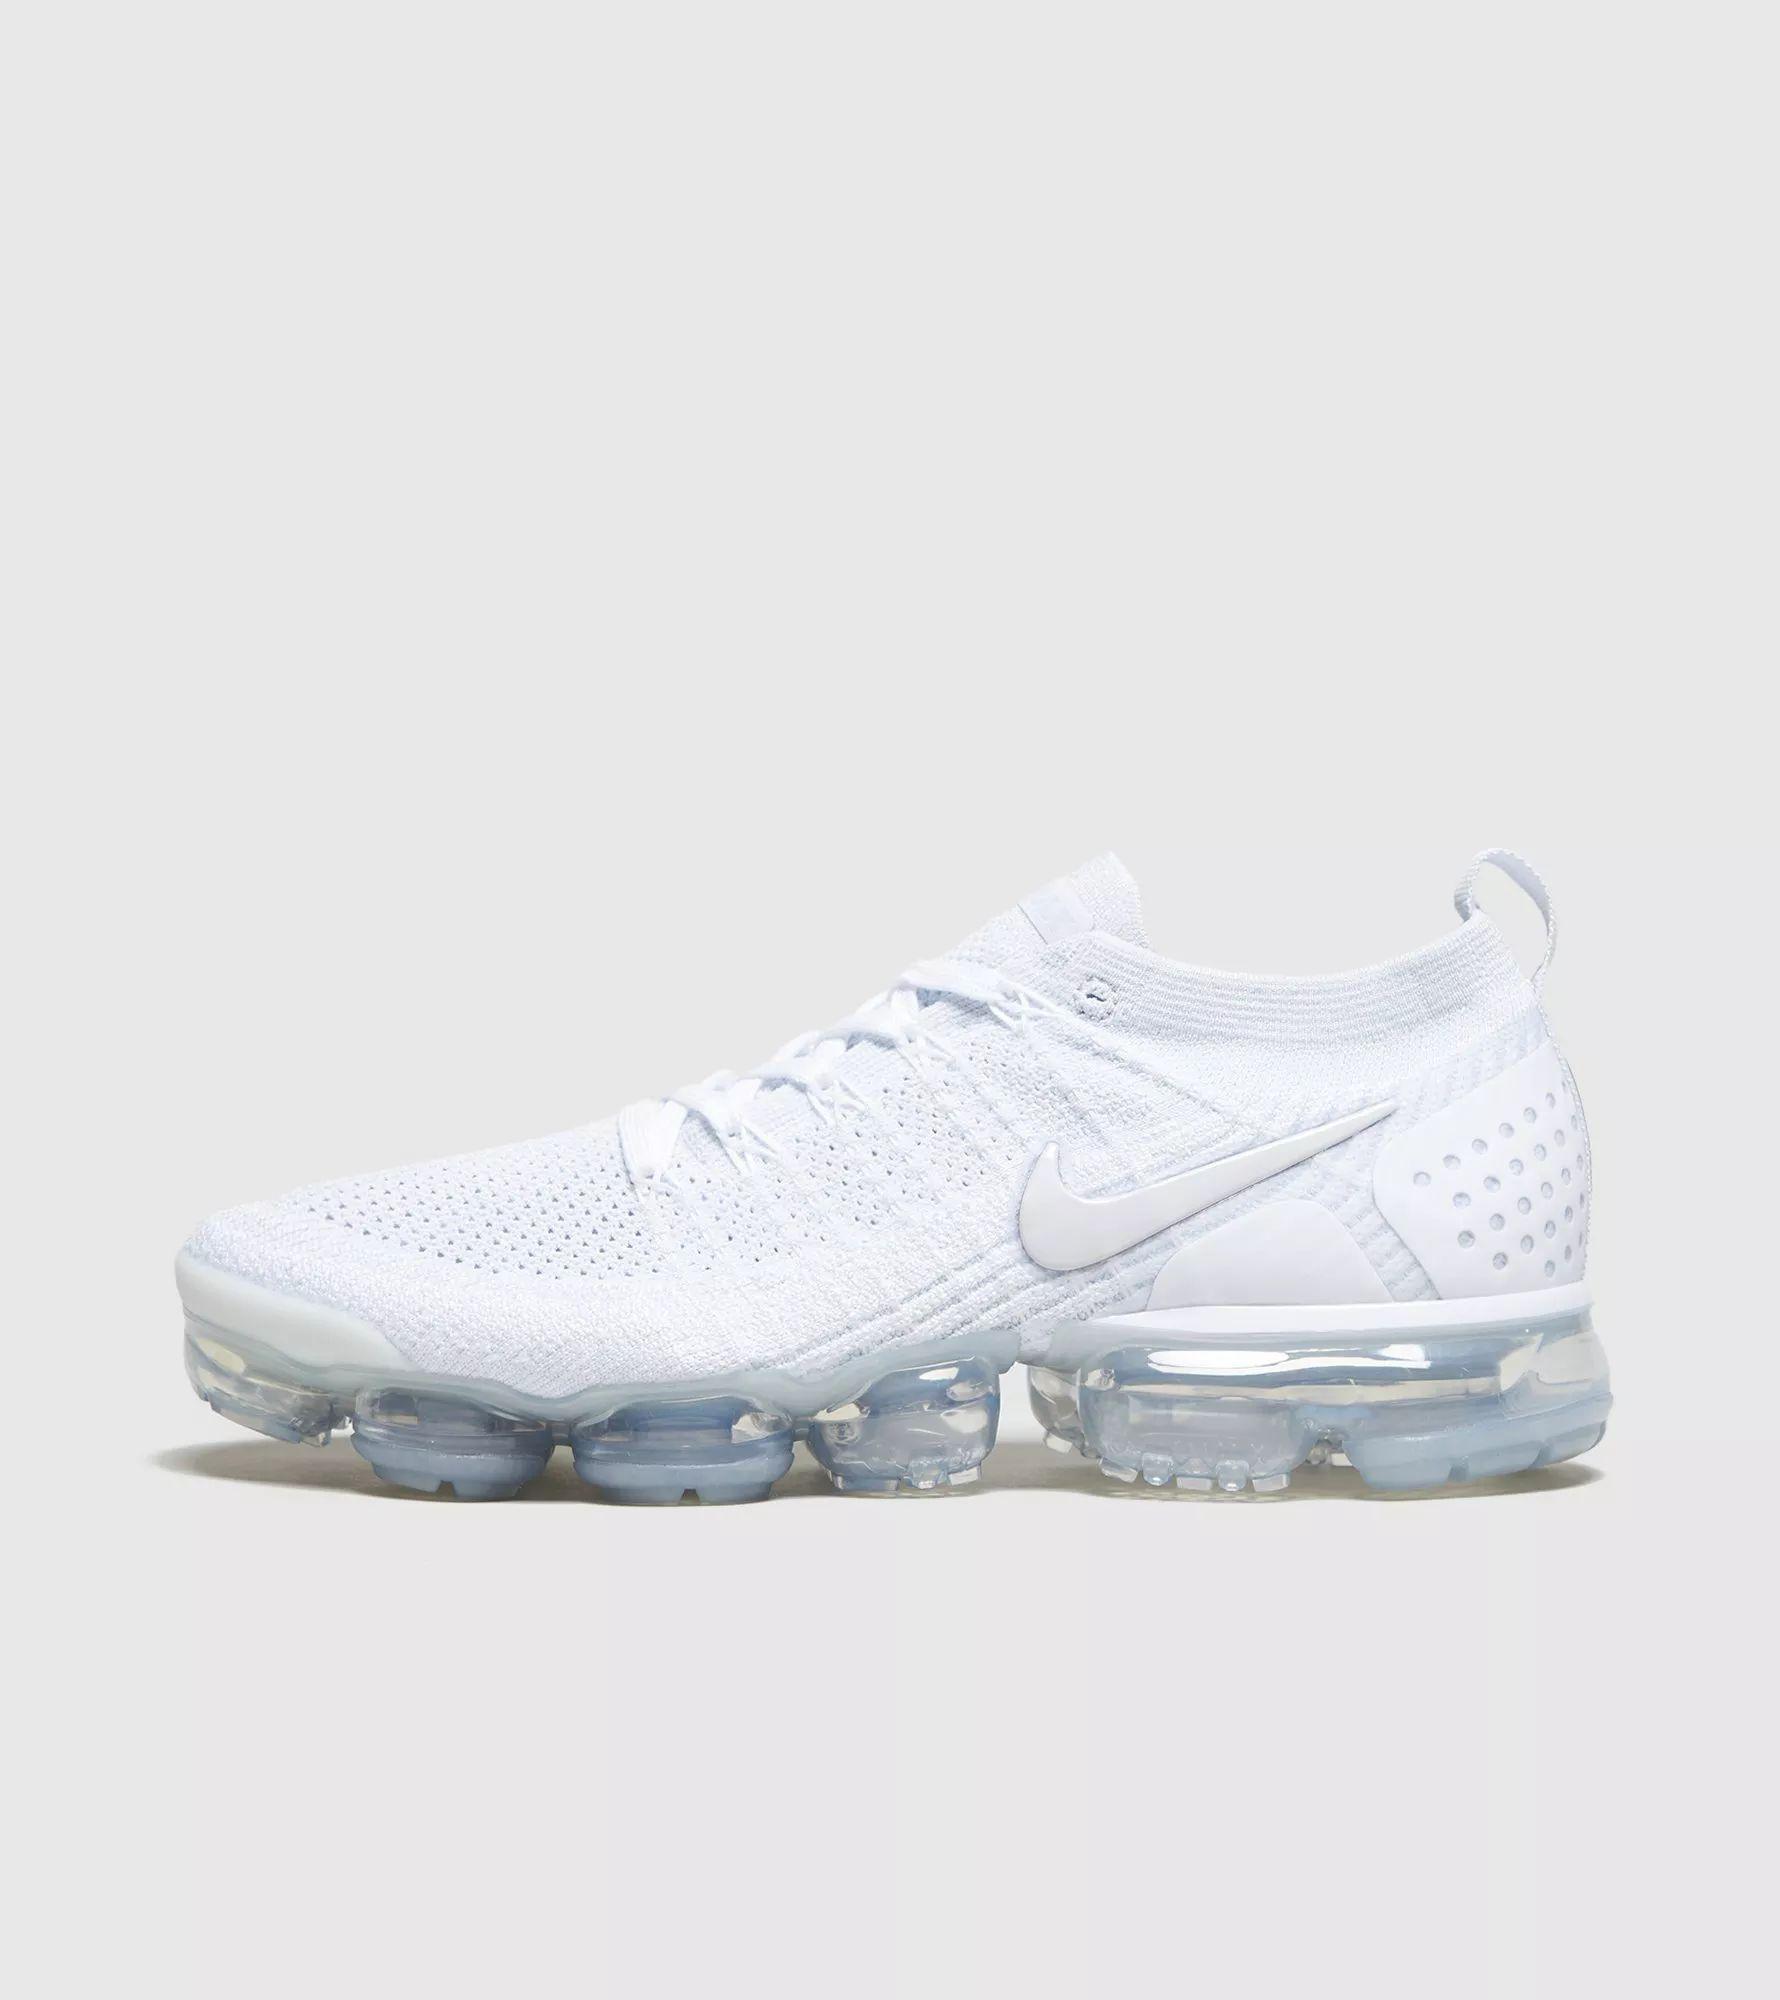 official photos c27eb 38032 Nike air vapormax flyknit 2 white white vast grey